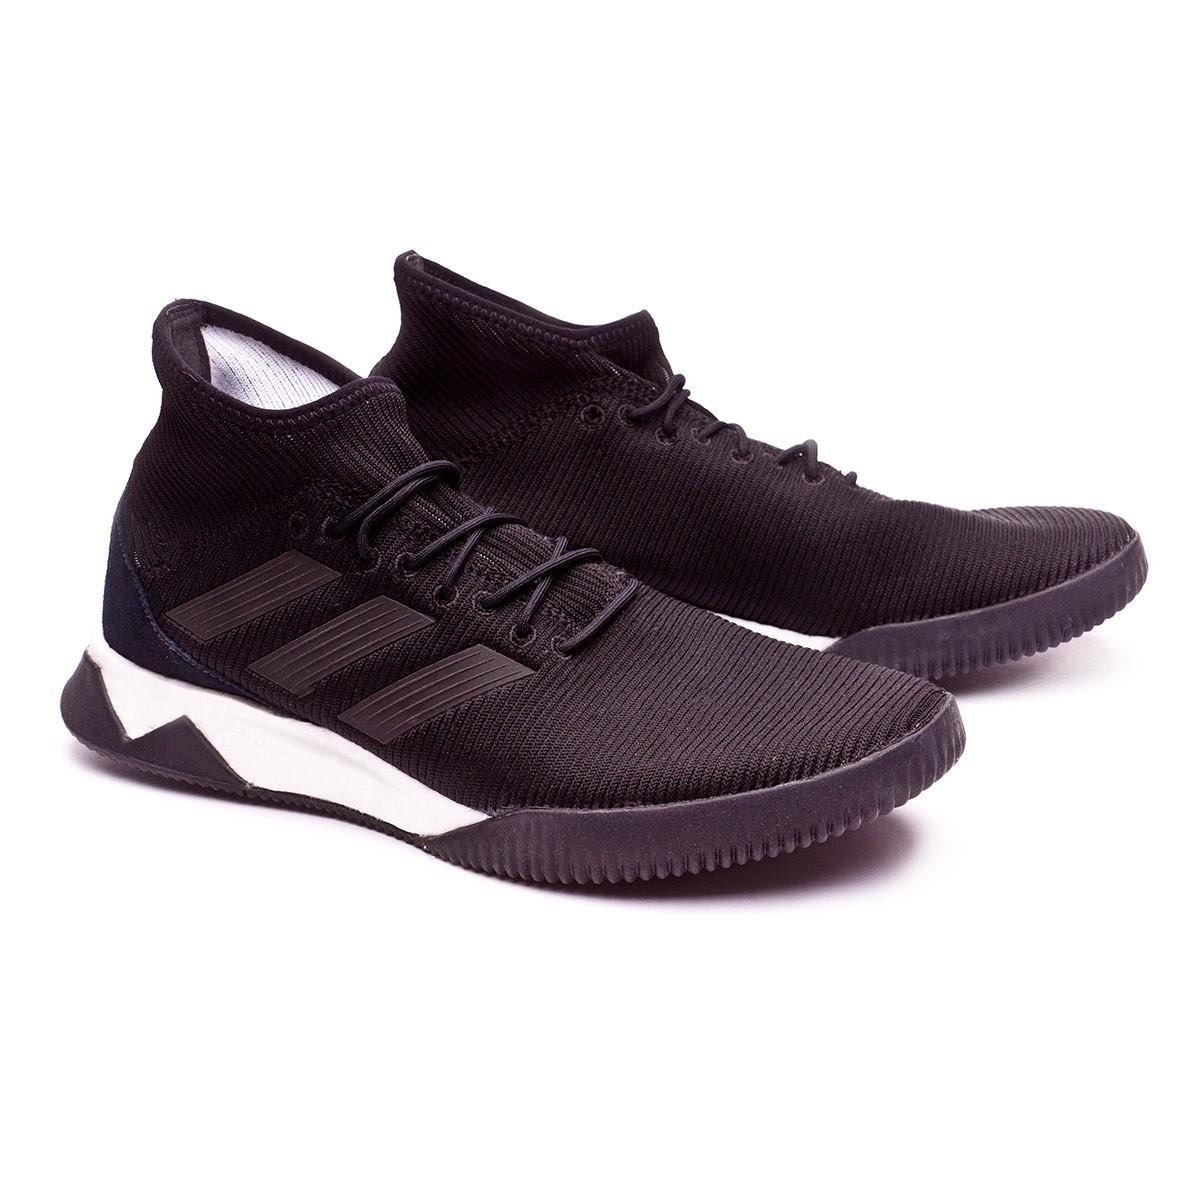 c1e13dc5579 adidas Predator Tango 18.1 TR Trainers. Core black-White ...